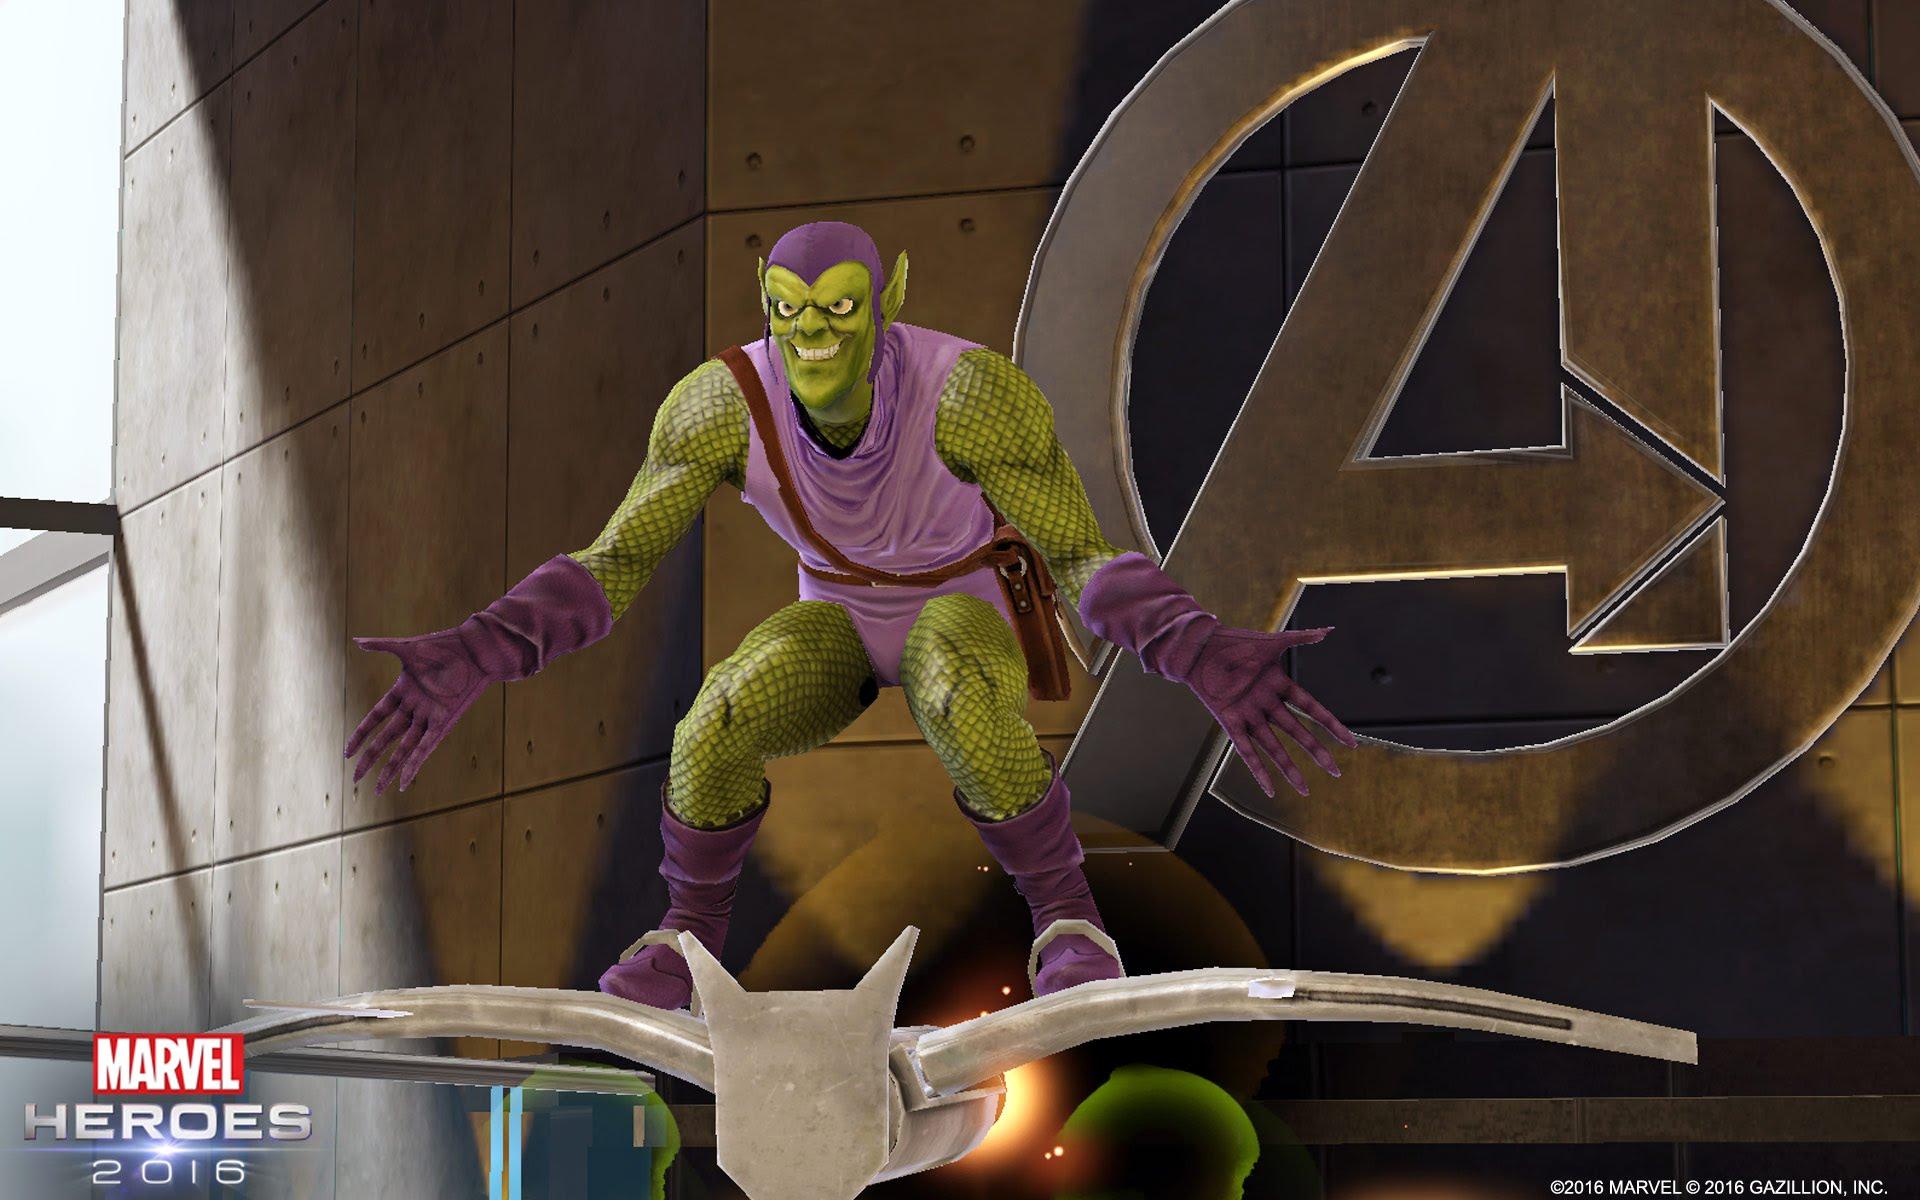 Green Goblin Wreaks Havoc in Marvel Heroes 2016!